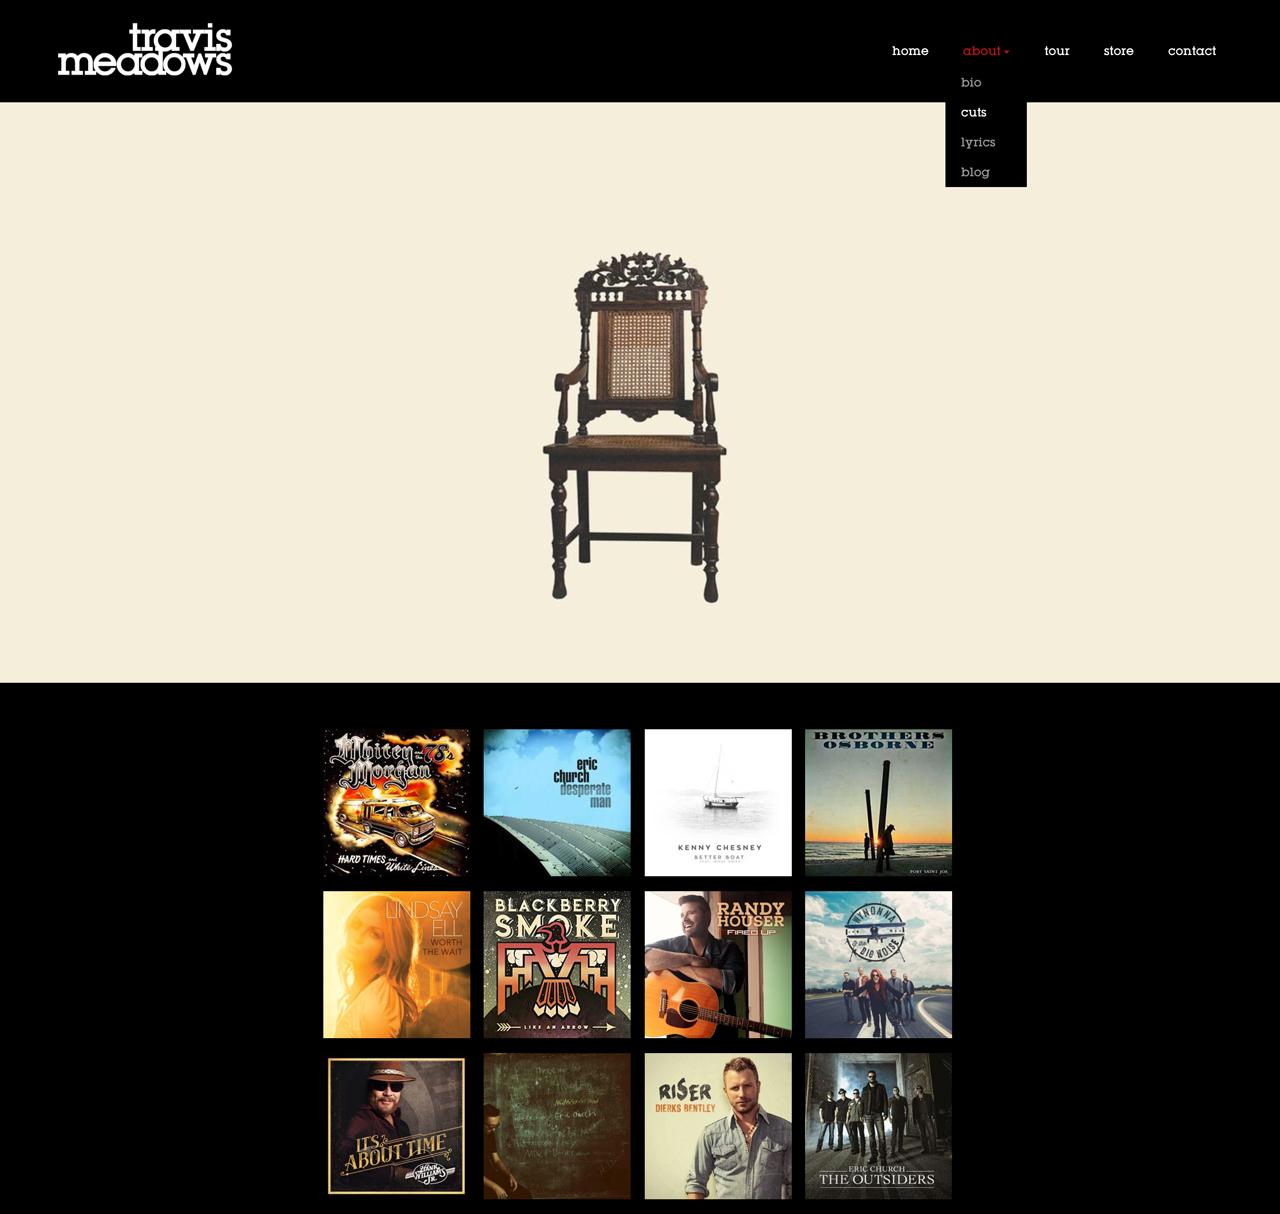 Best songwriter websites: Travis Meadows